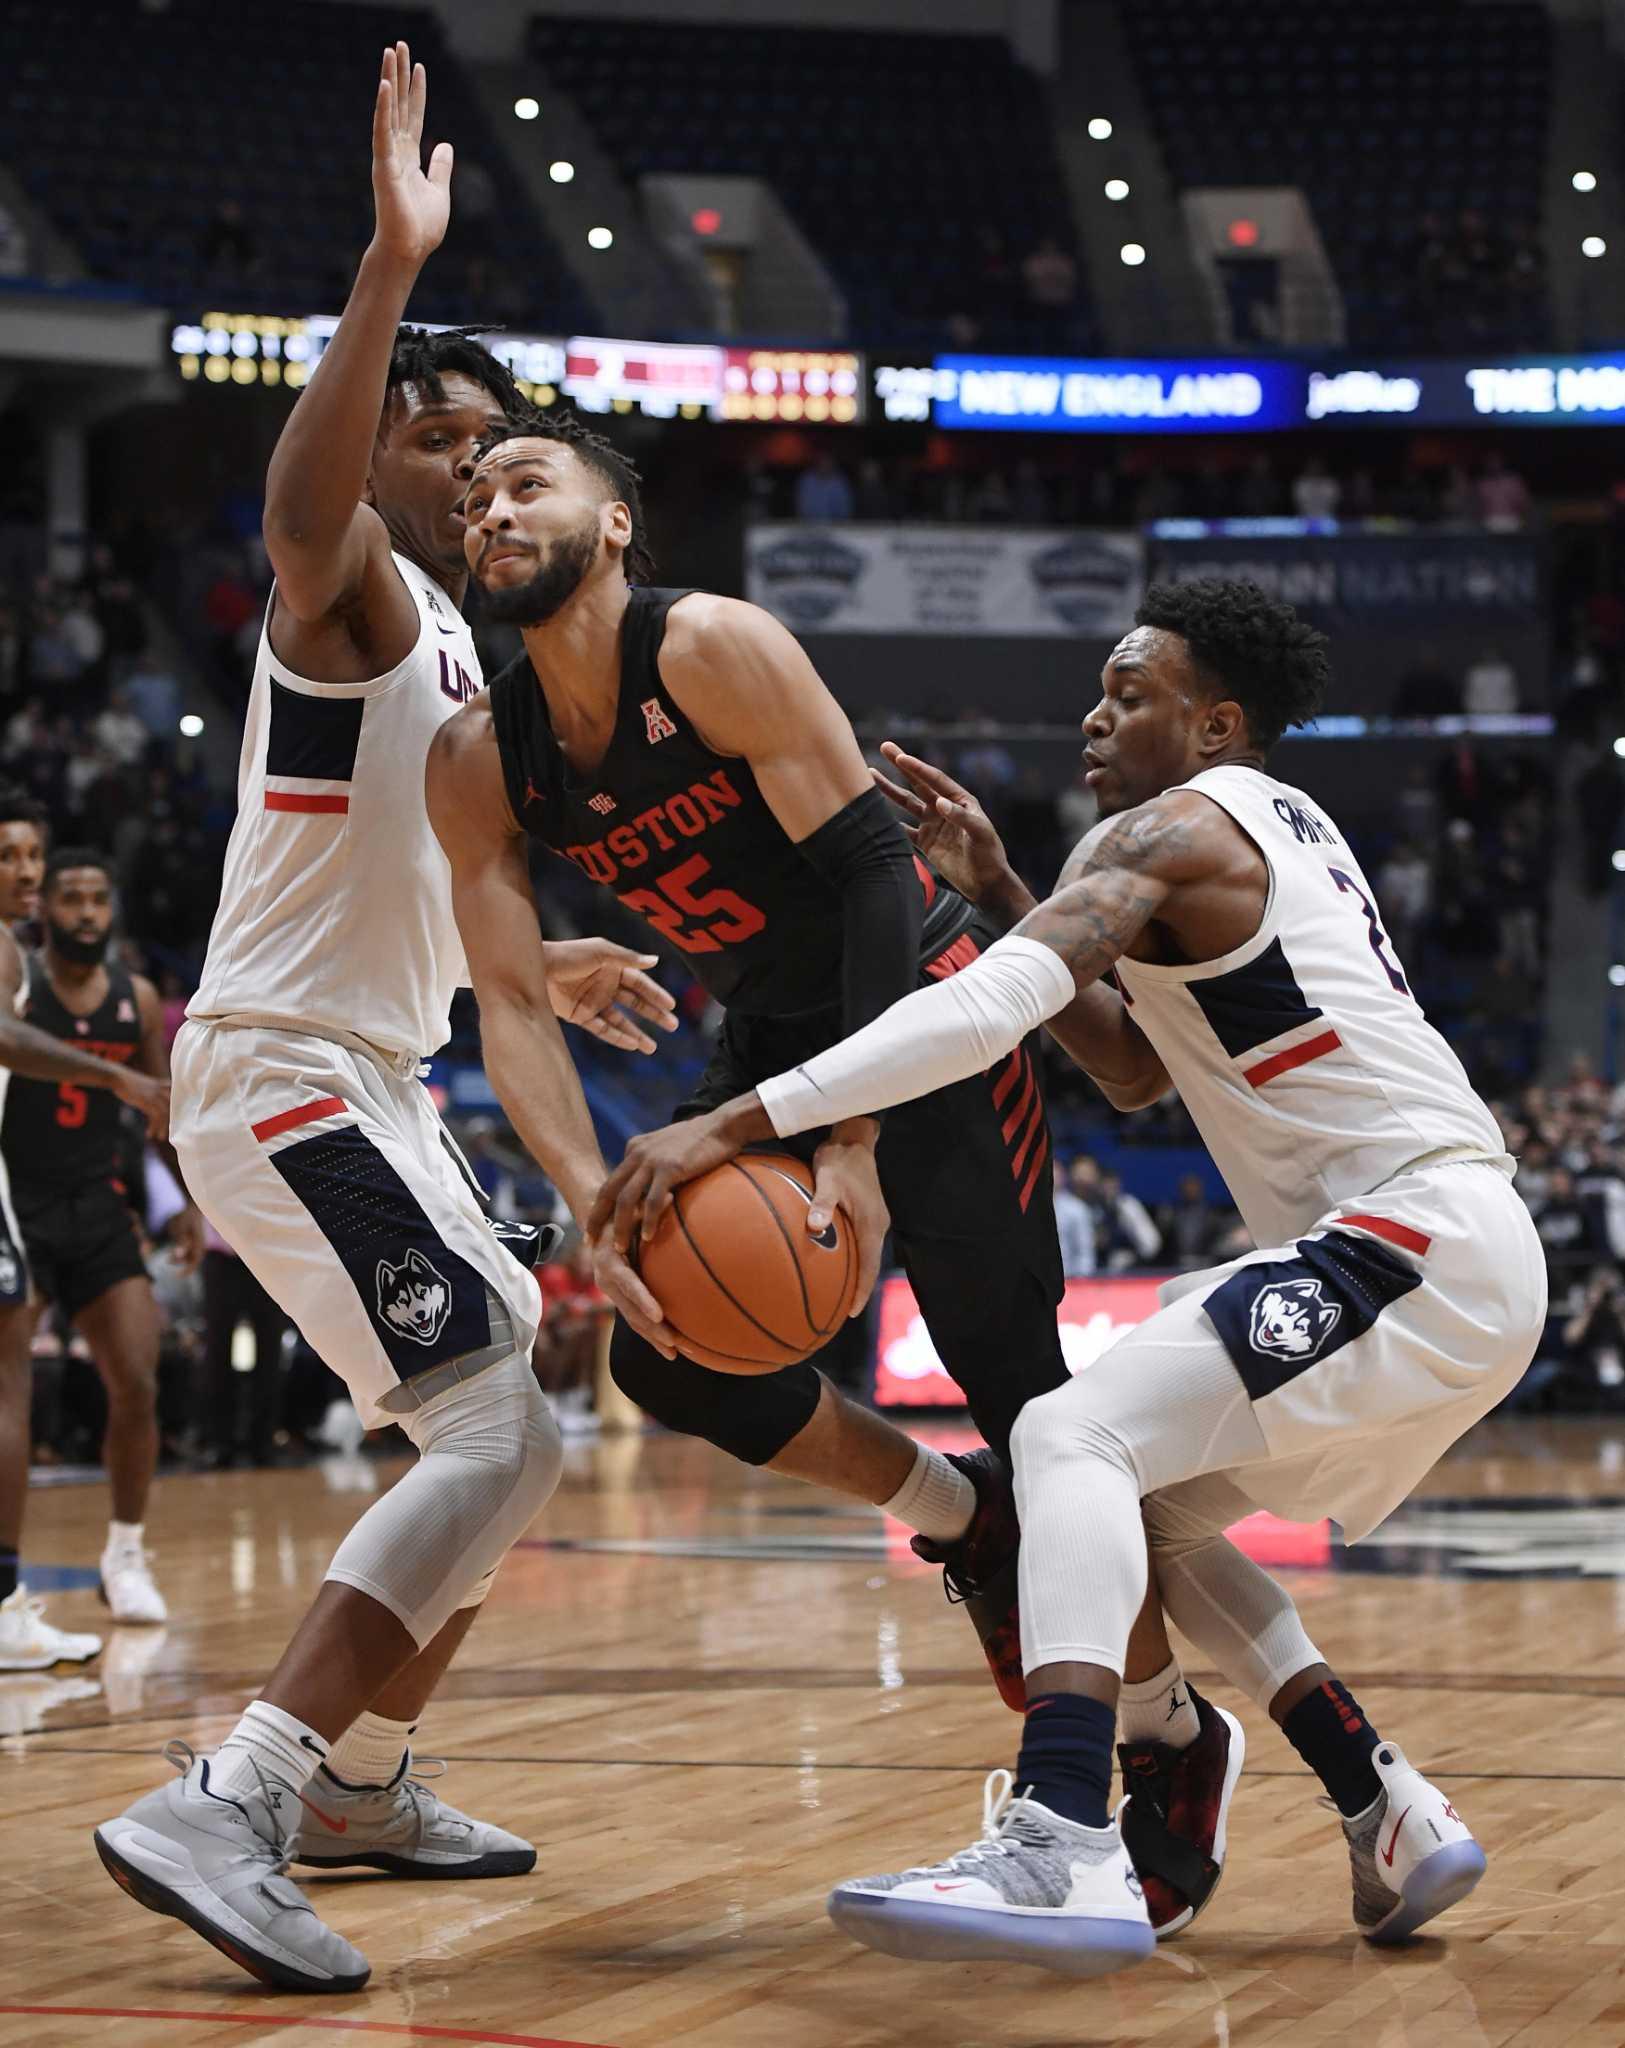 UConn men's gameday: No. 9 UConn vs. No. 1 Houston - New ...